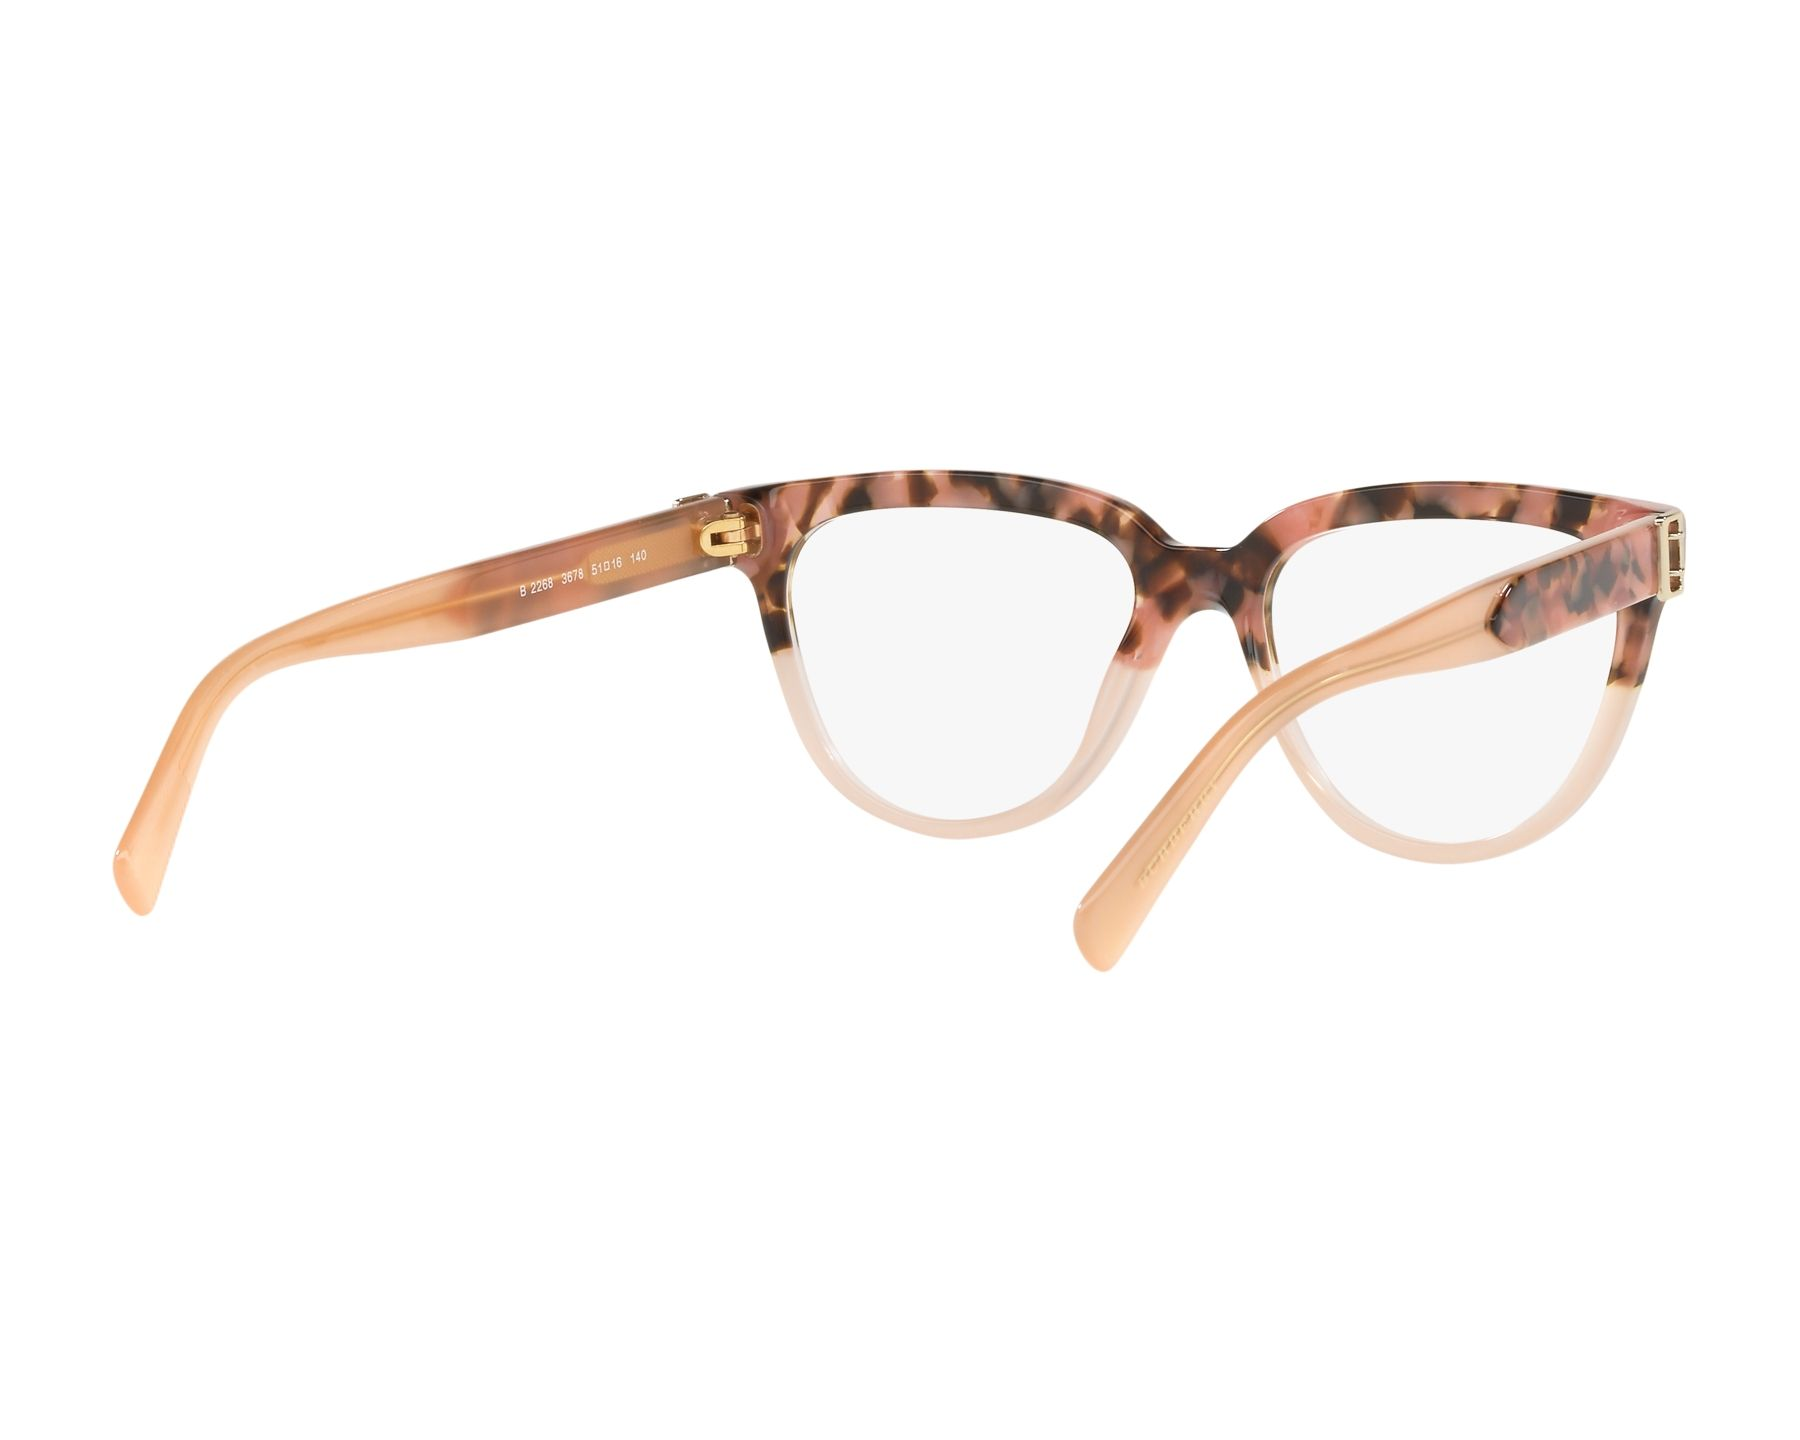 Burberry Väska Rosa : Burberry eyeglasses be  rosa visionet